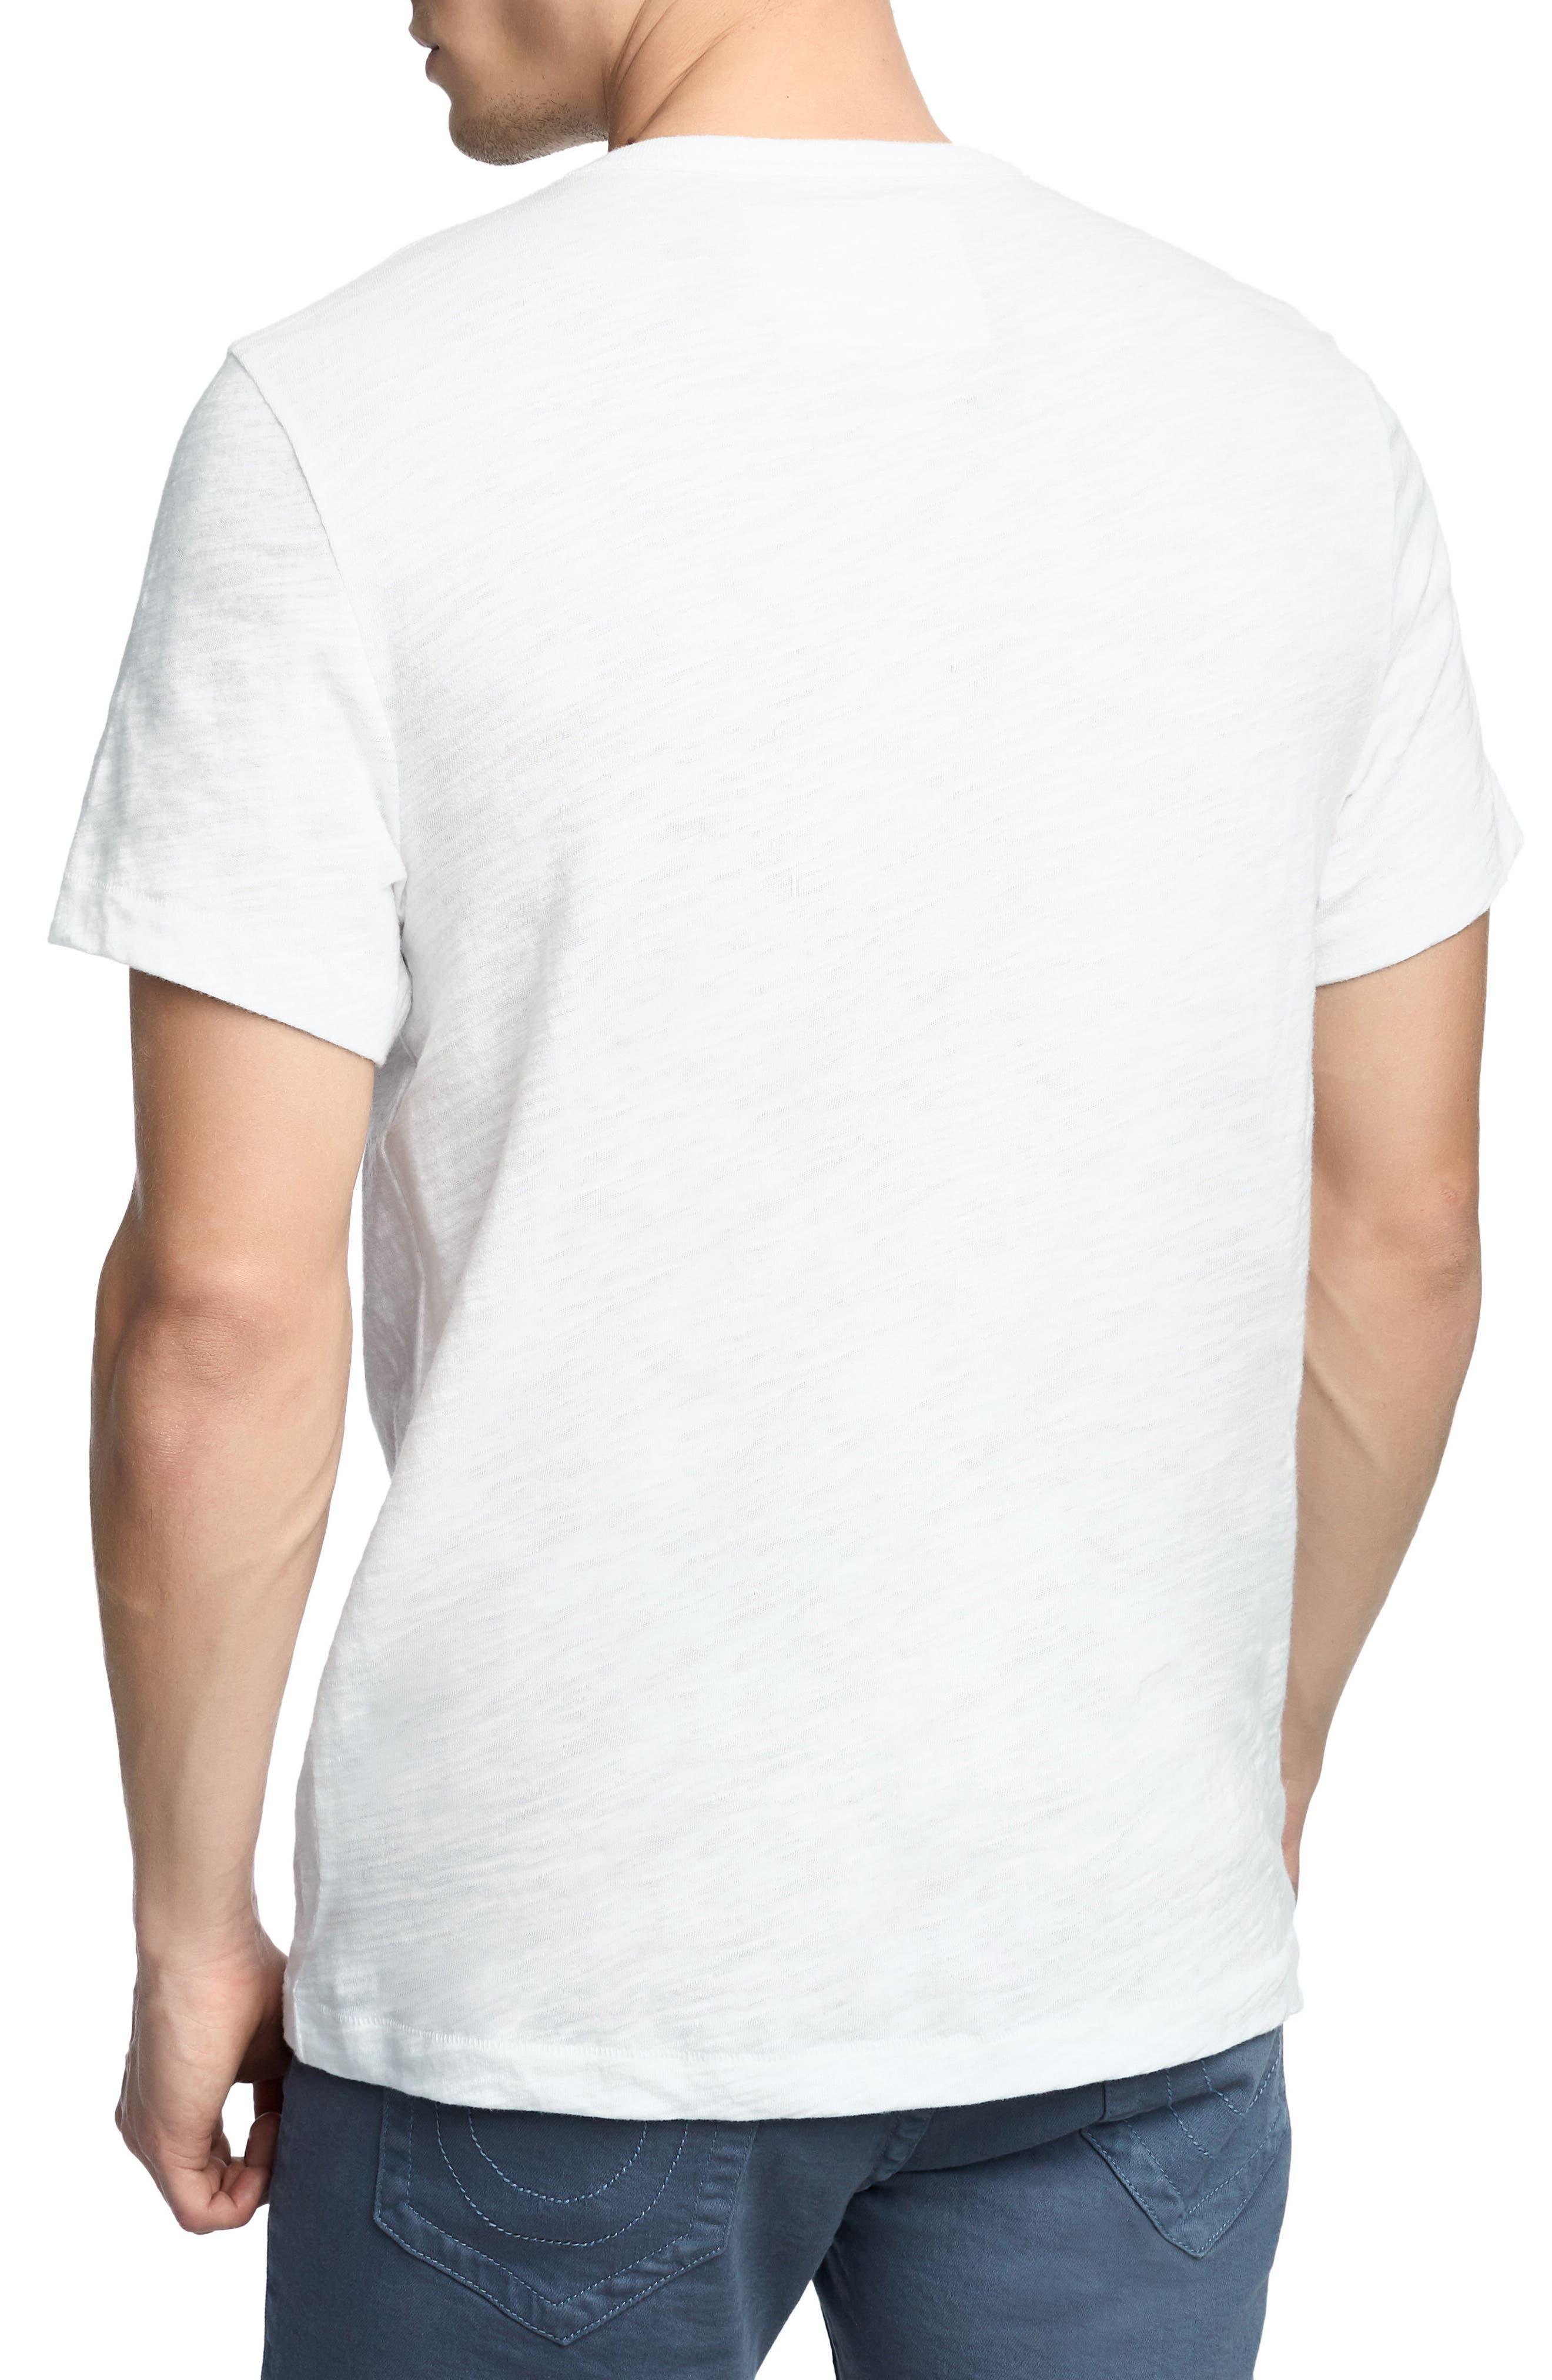 TRUE RELIGION BRAND JEANS,                             Born Free T-Shirt,                             Alternate thumbnail 2, color,                             100